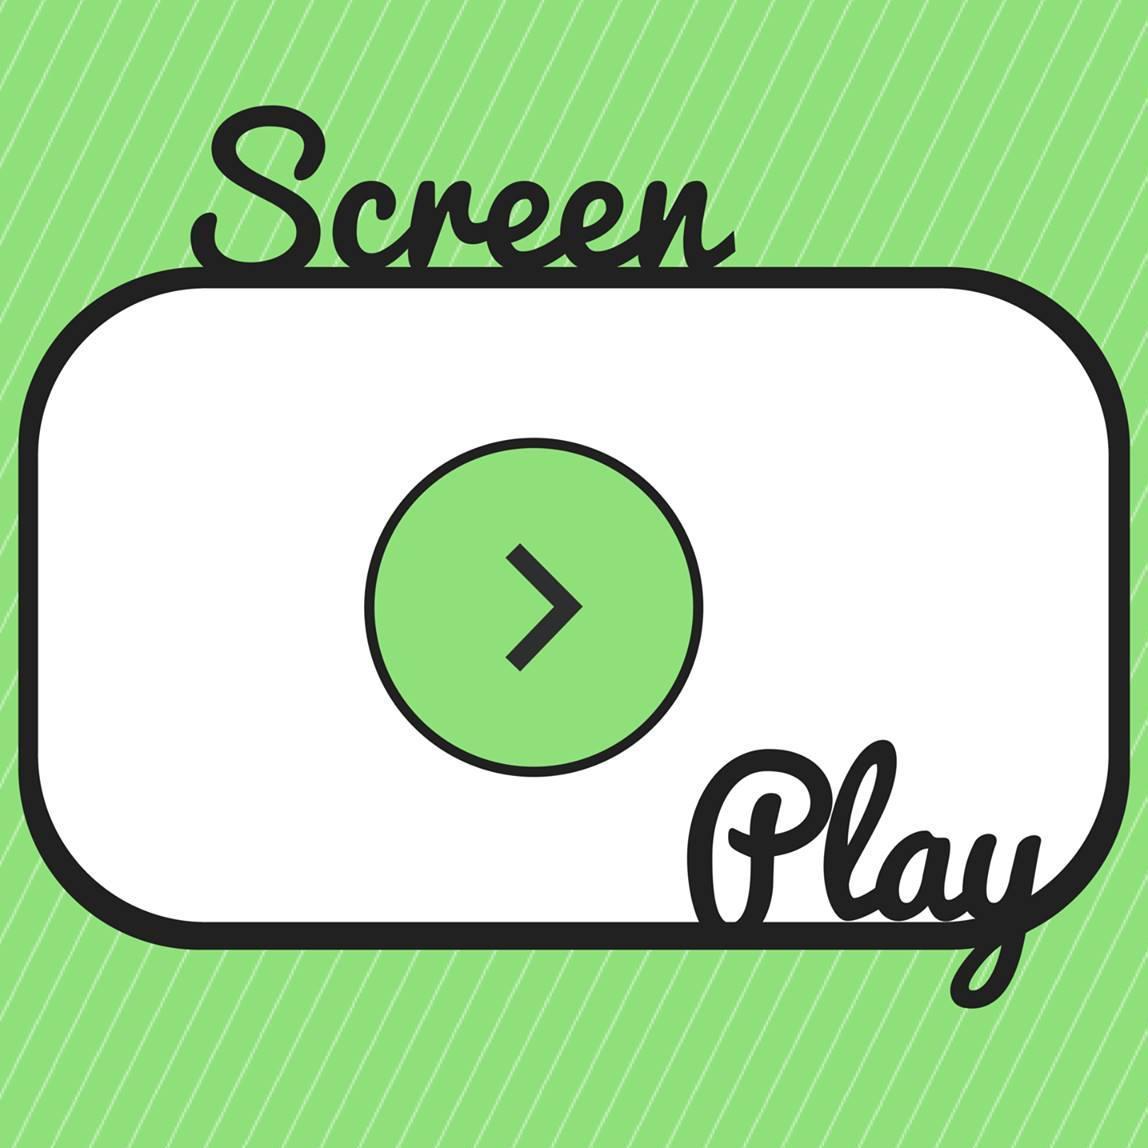 screenplay tv screenplay tv twitter